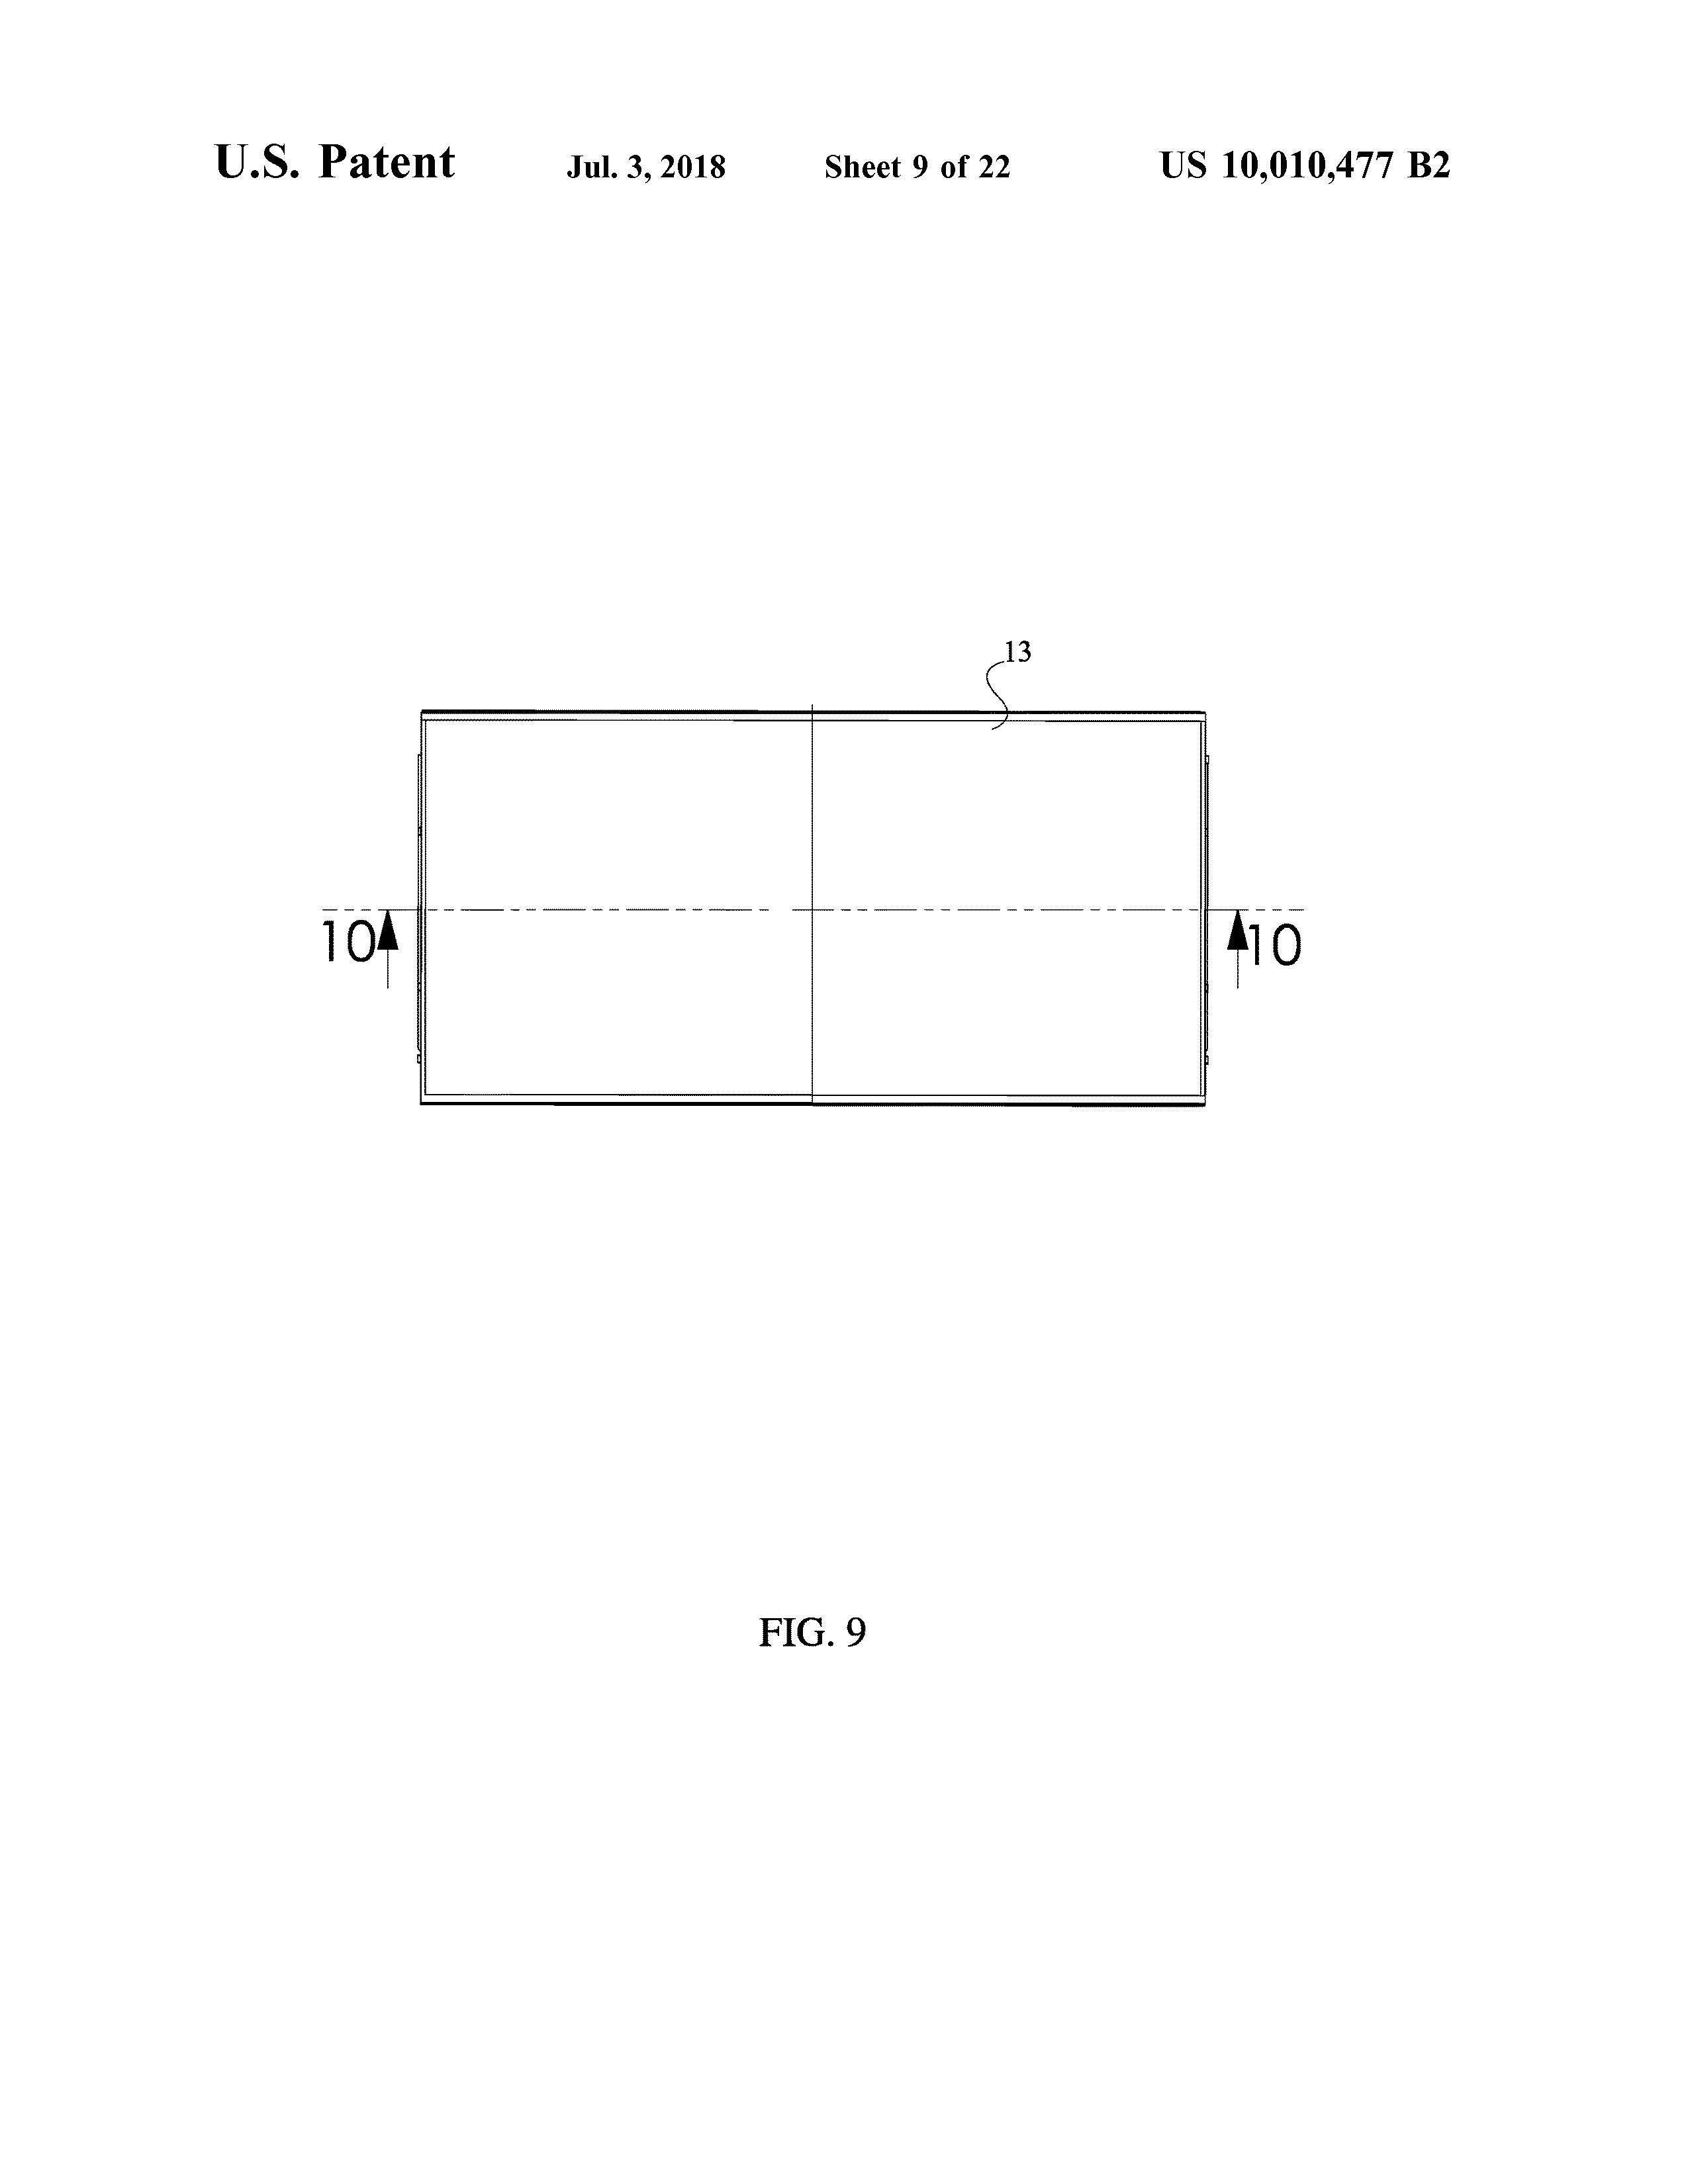 Sauna Tent Patent Page 11